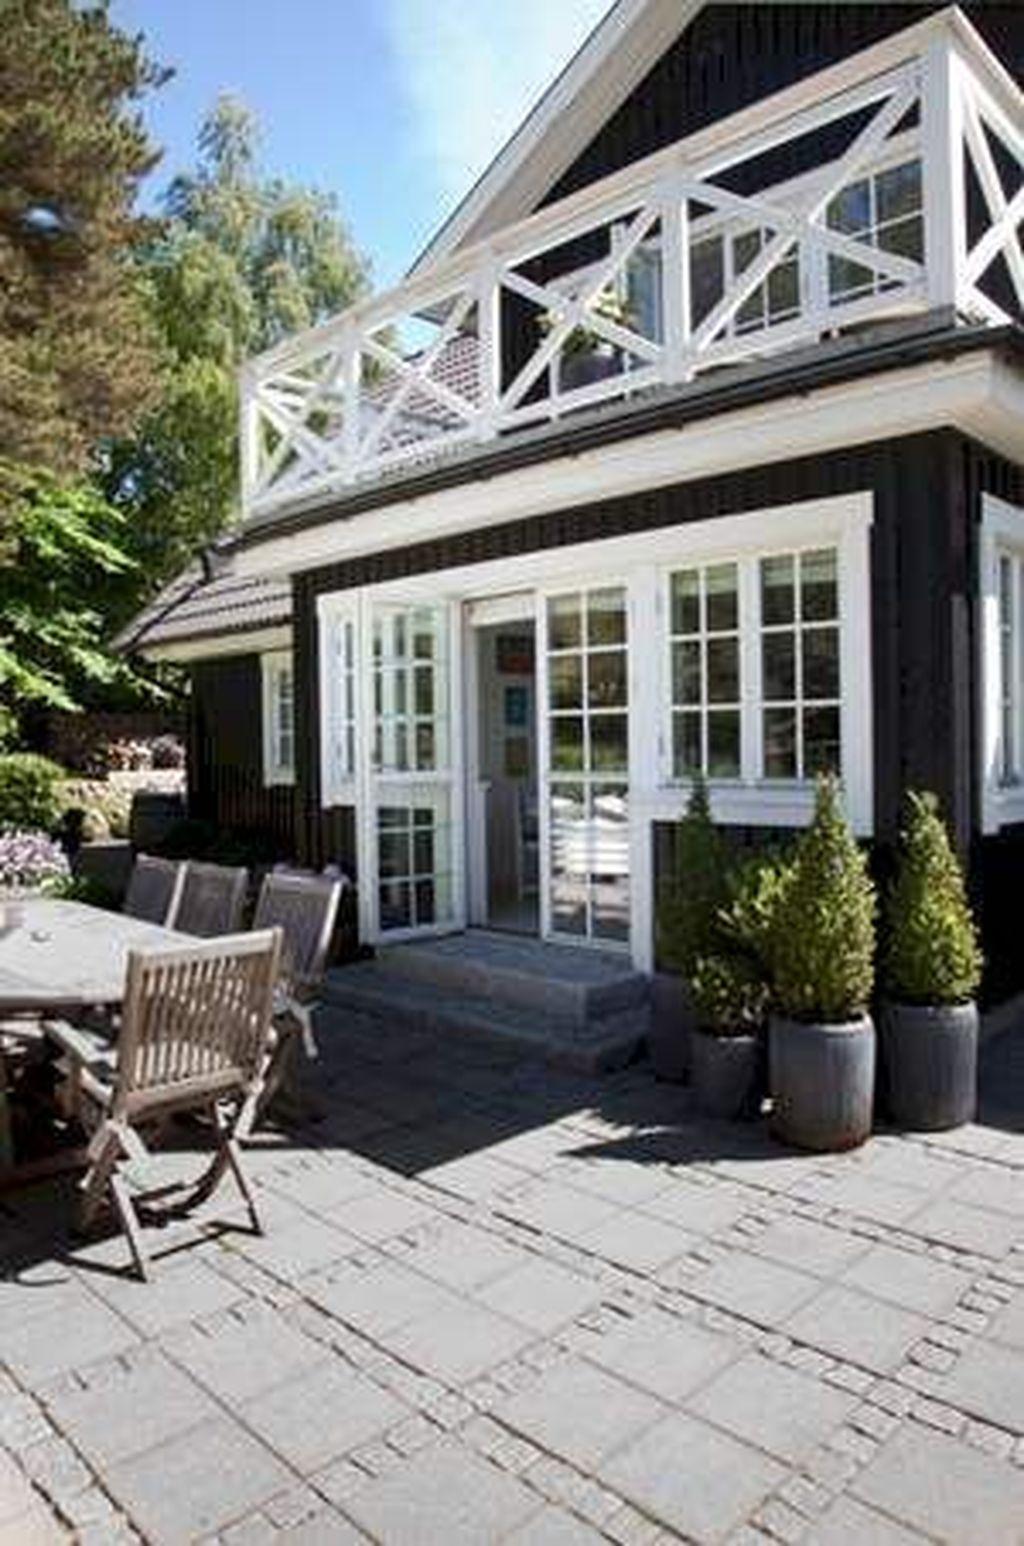 Stunning Summer House Colors Exterior Ideas 30